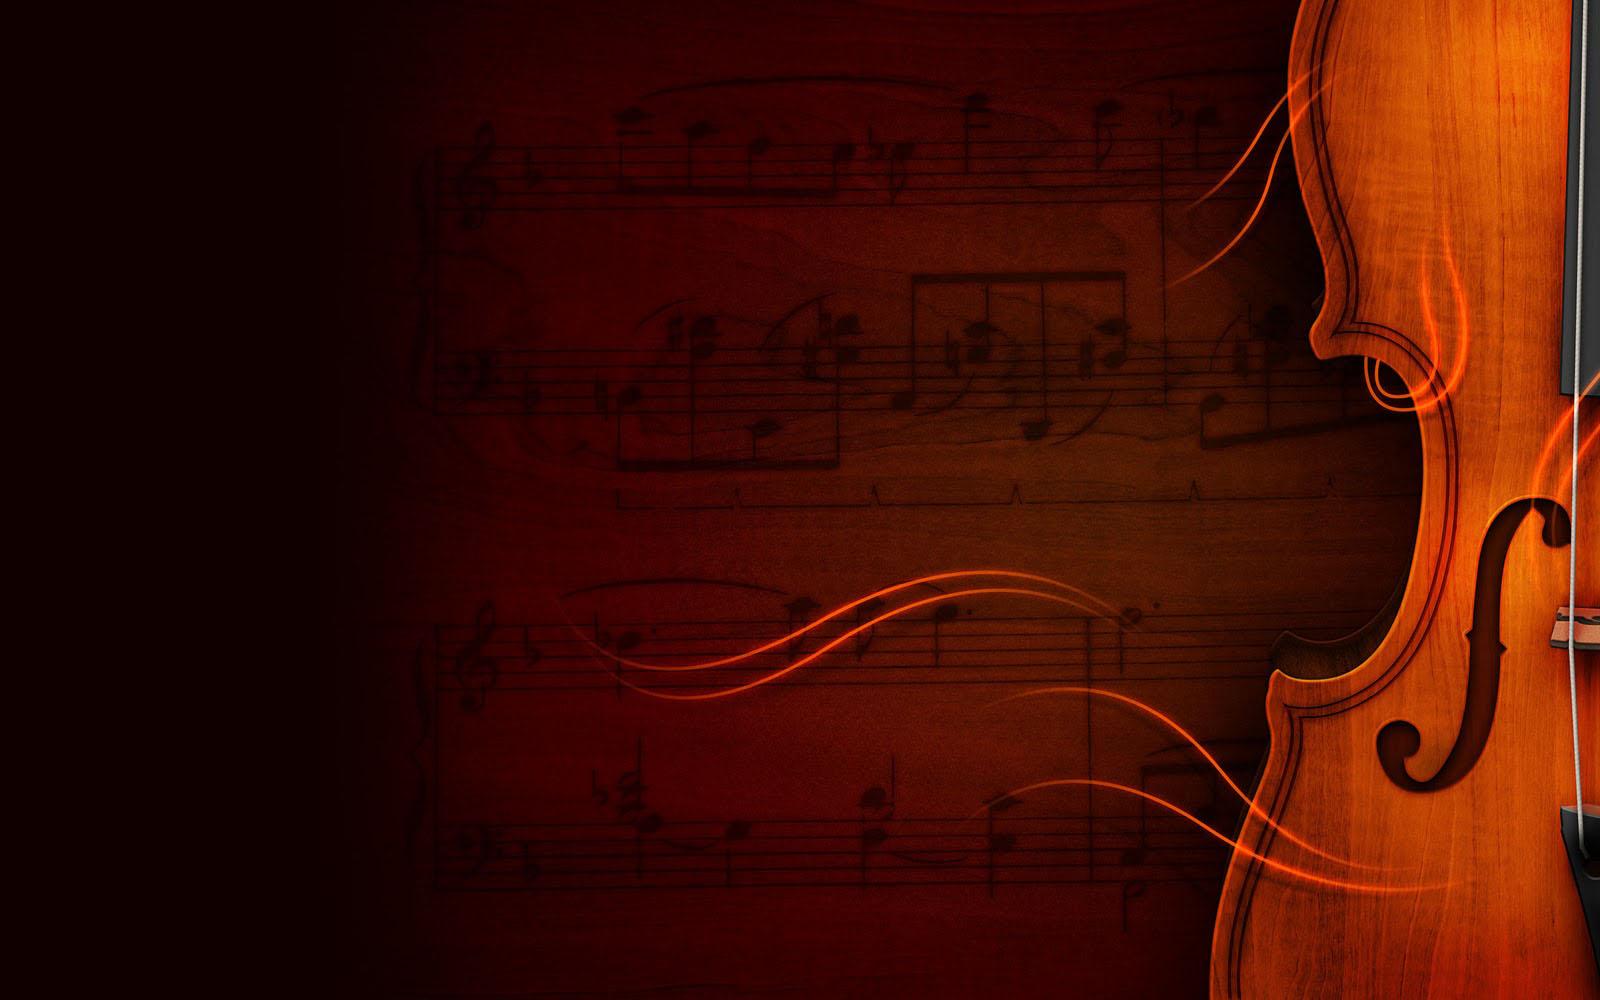 back-violinC1B747FB-1D6C-2E1A-E7BE-546008D3A301.jpg